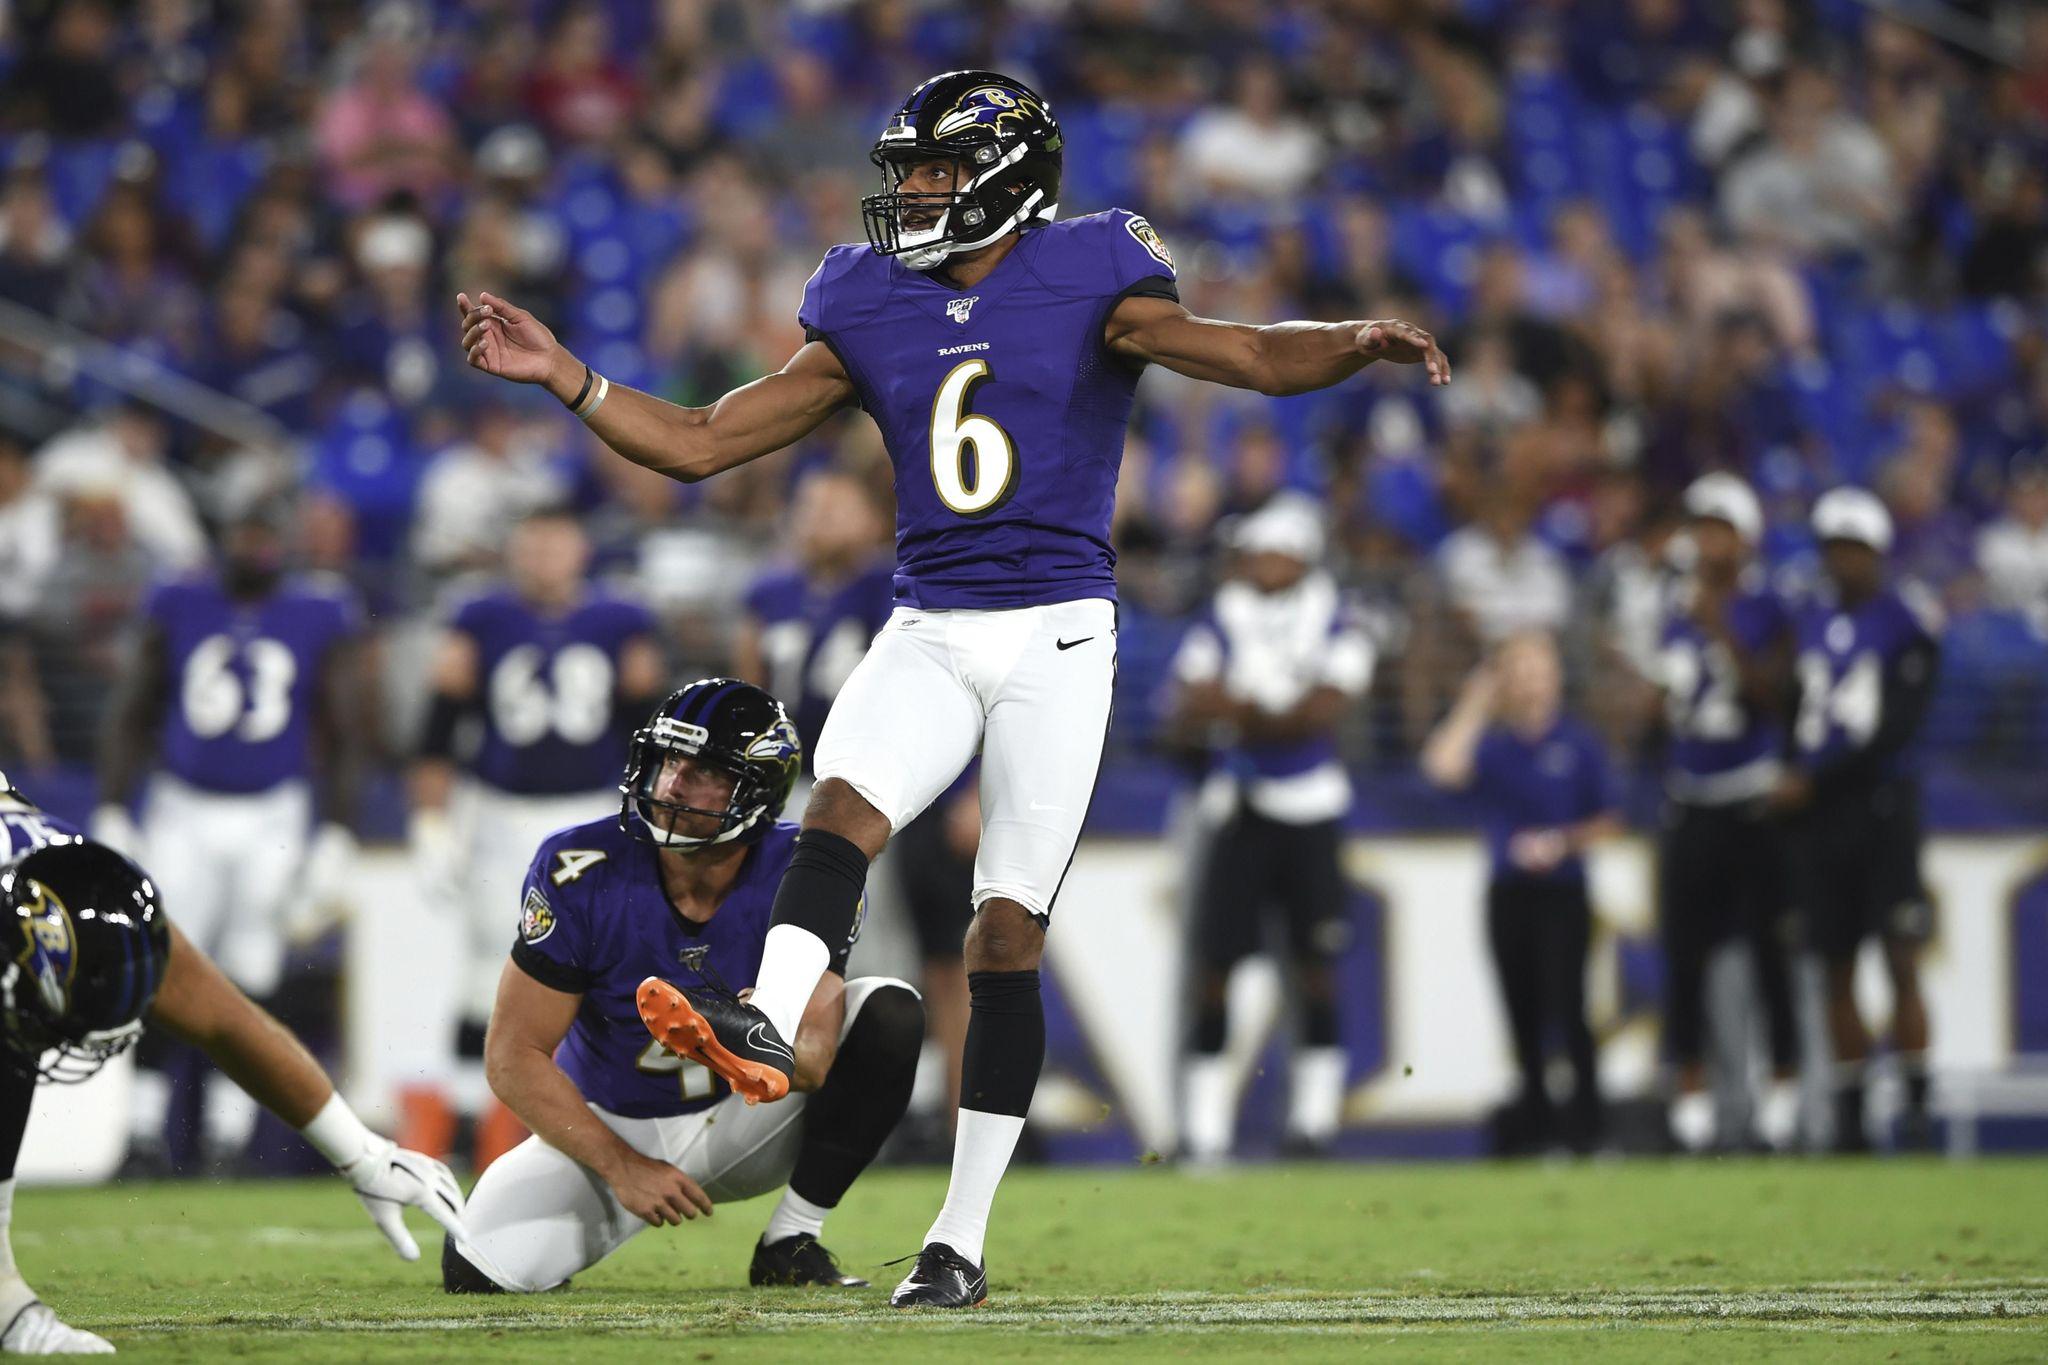 Ravens_vikings_trade_football_47198_s2048x1365